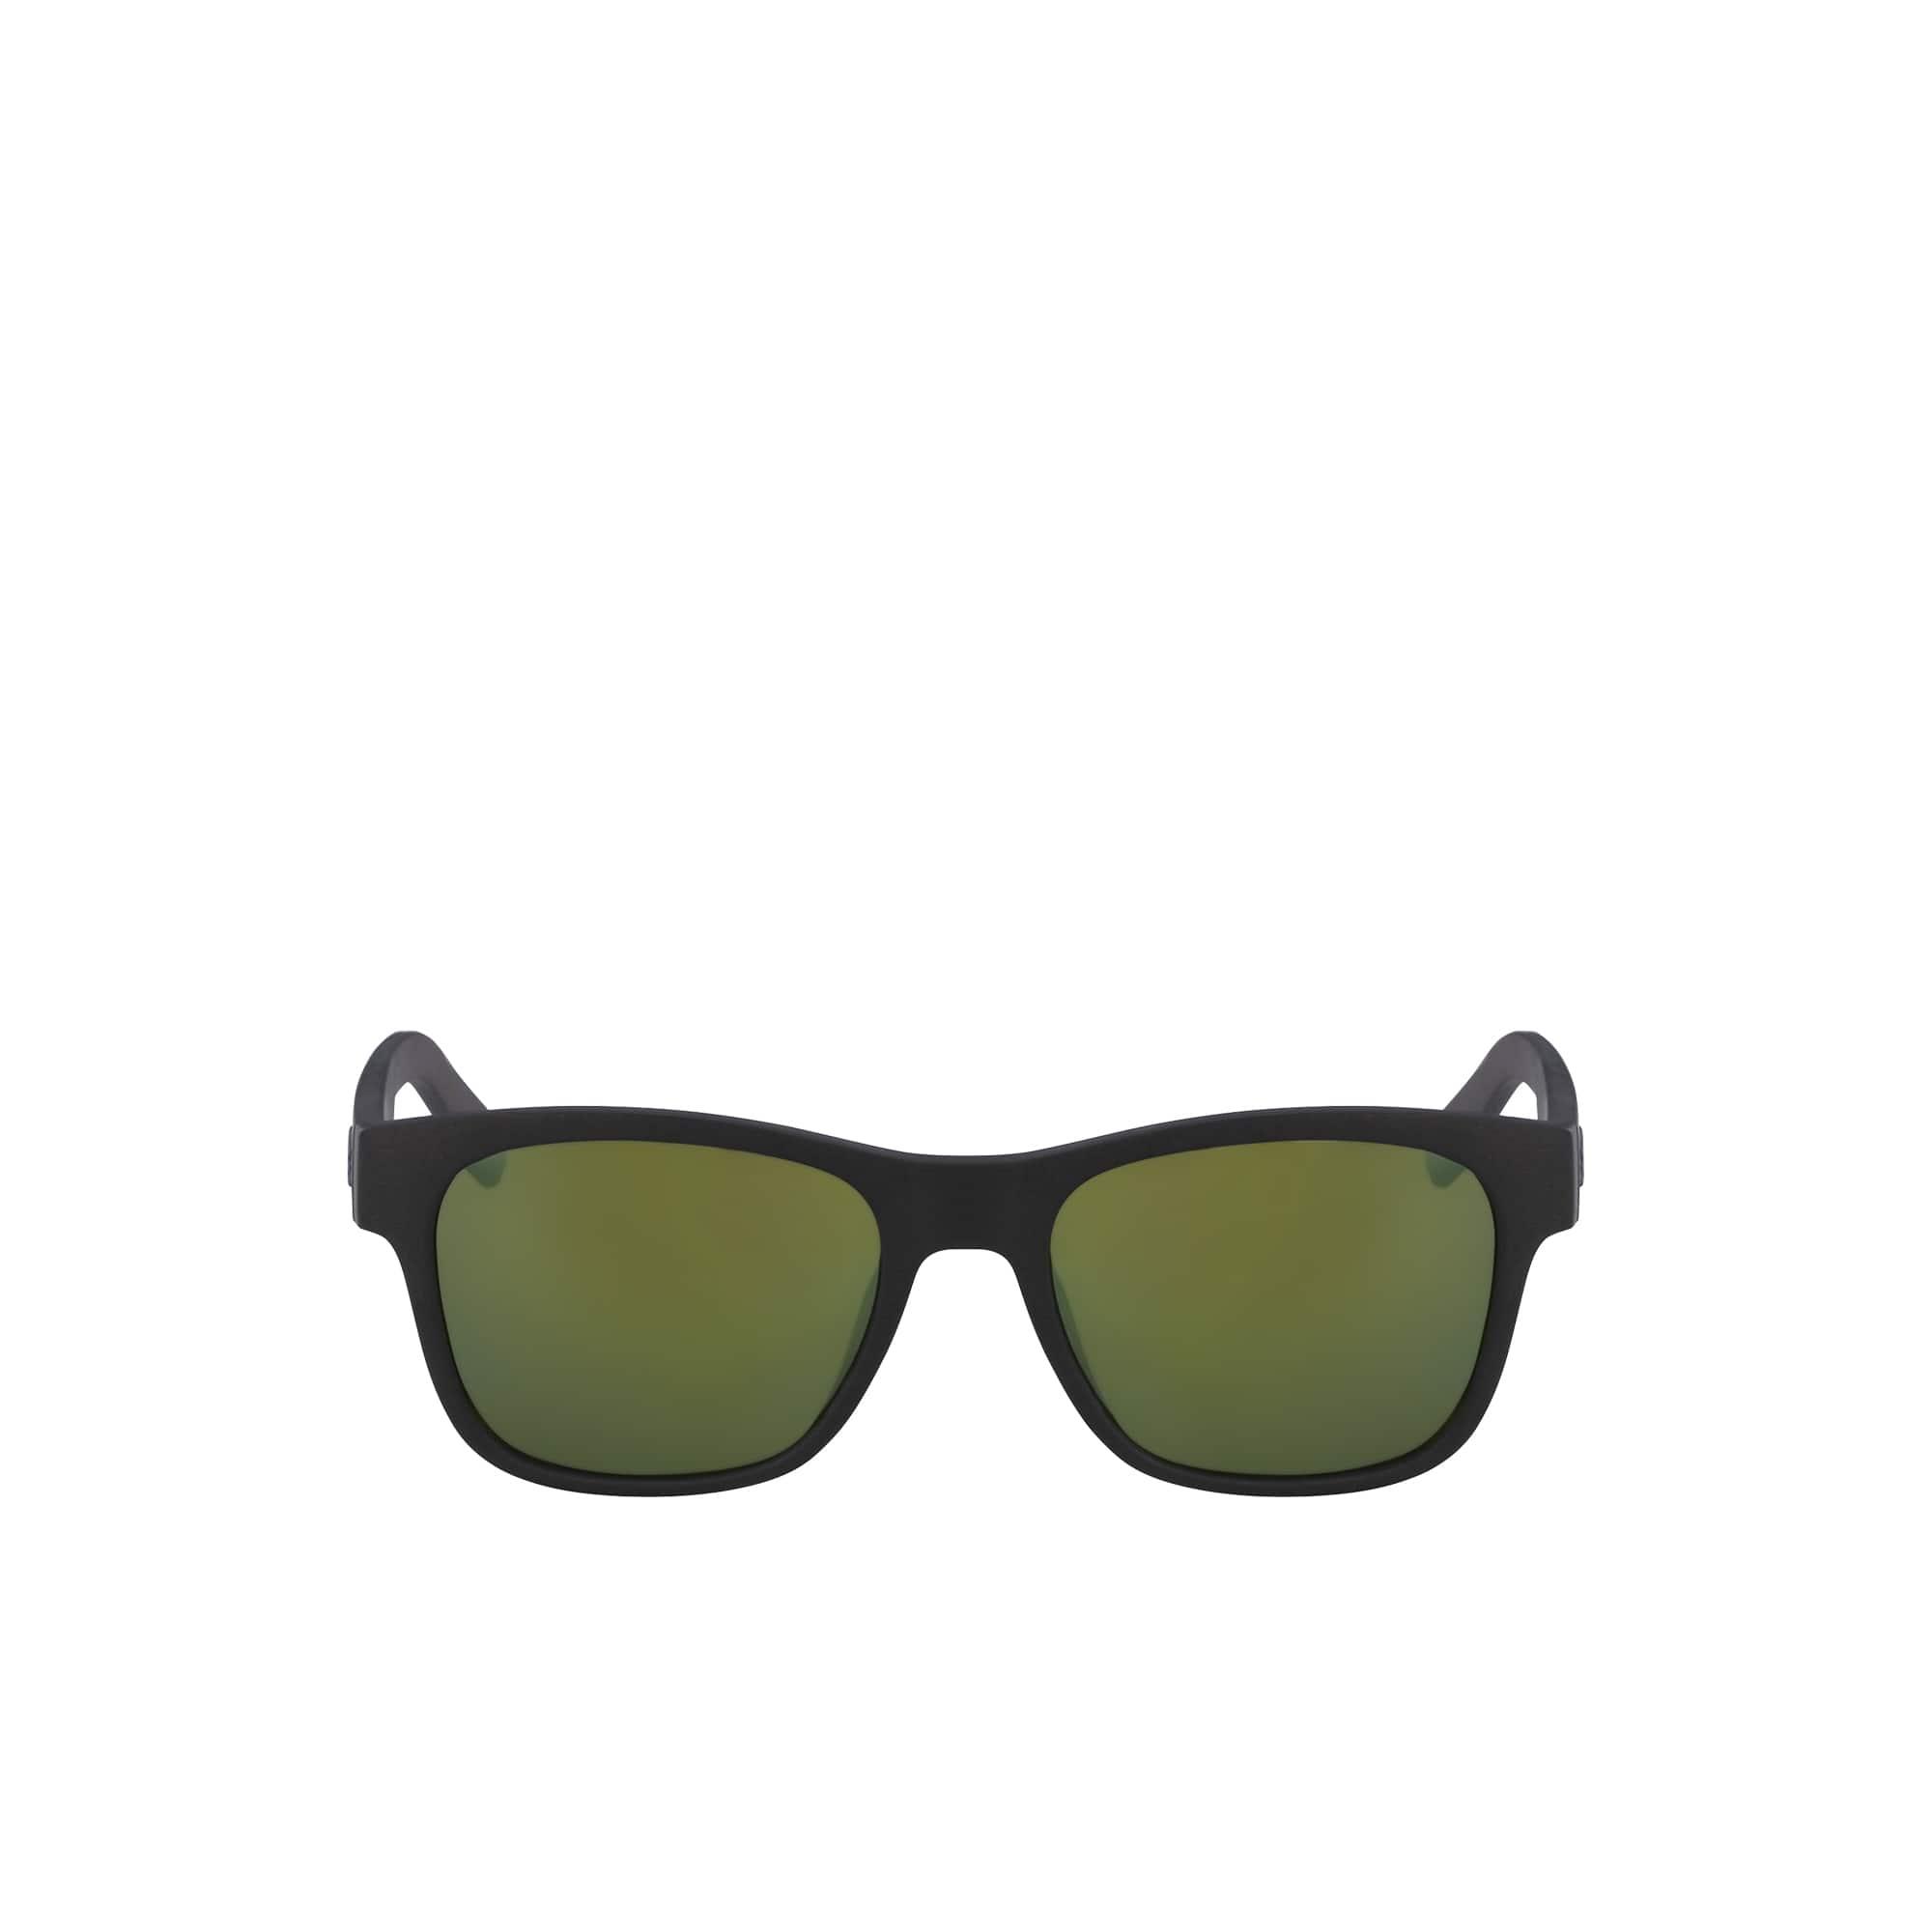 Spritzguss-kunstoff-Sonnenbrille Novak Djokovic Edition